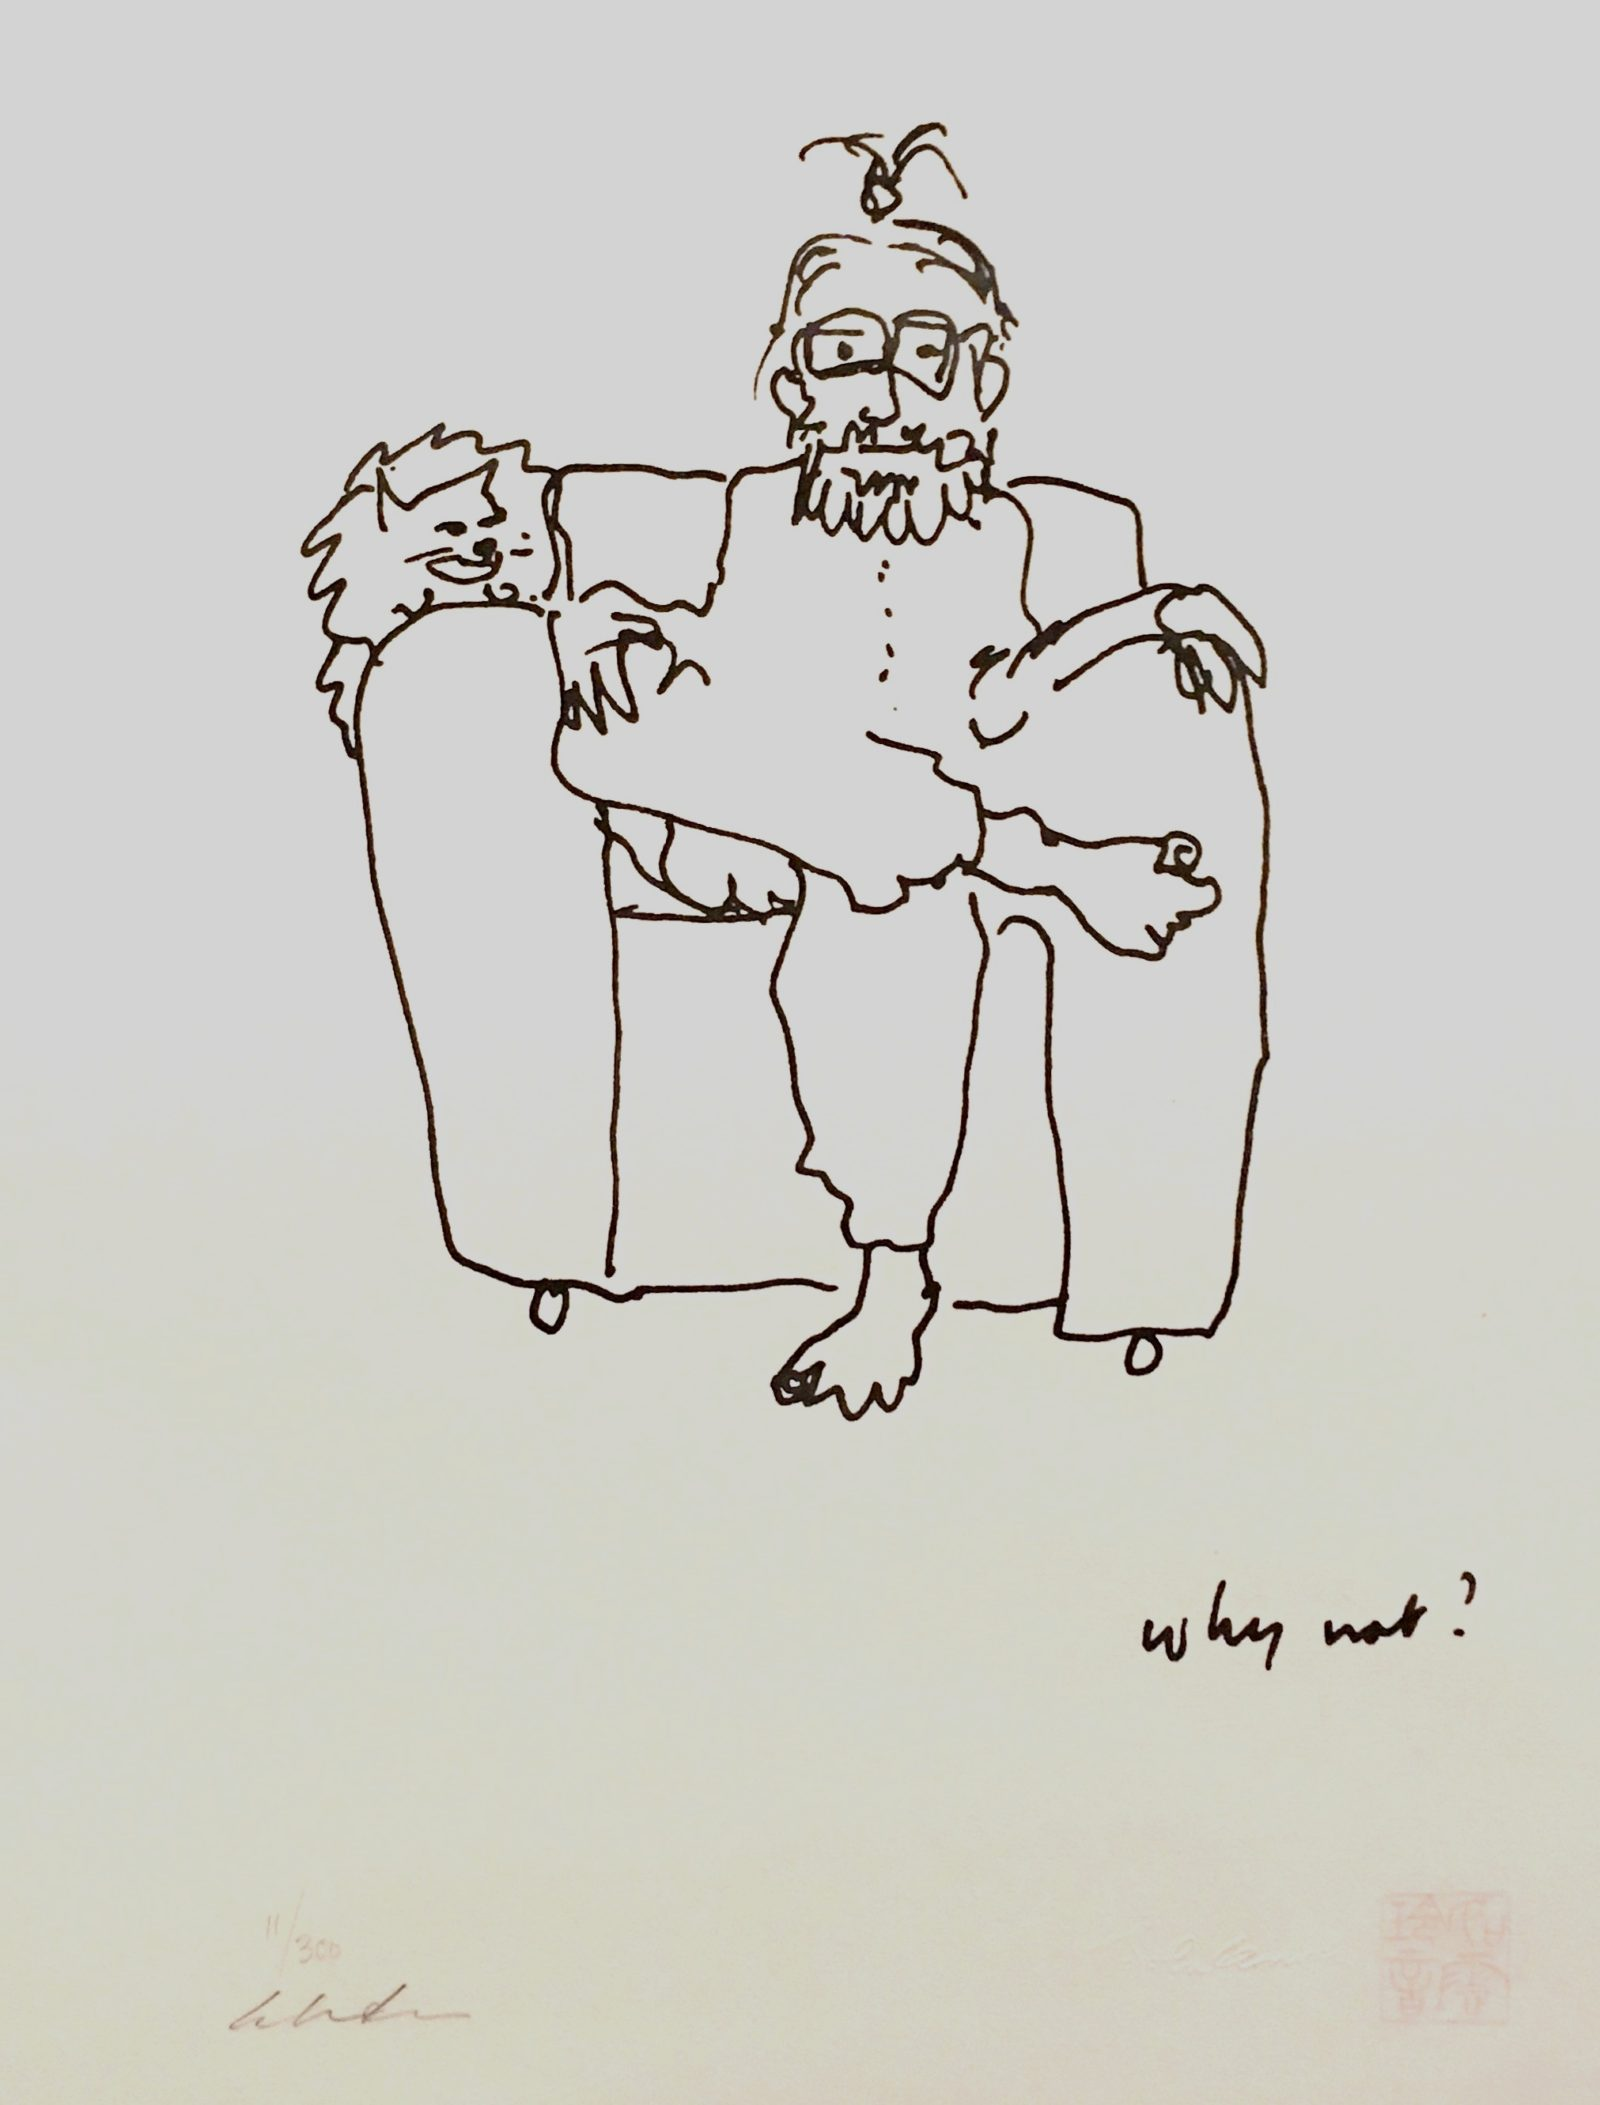 Why not? dibujo de John Lennon